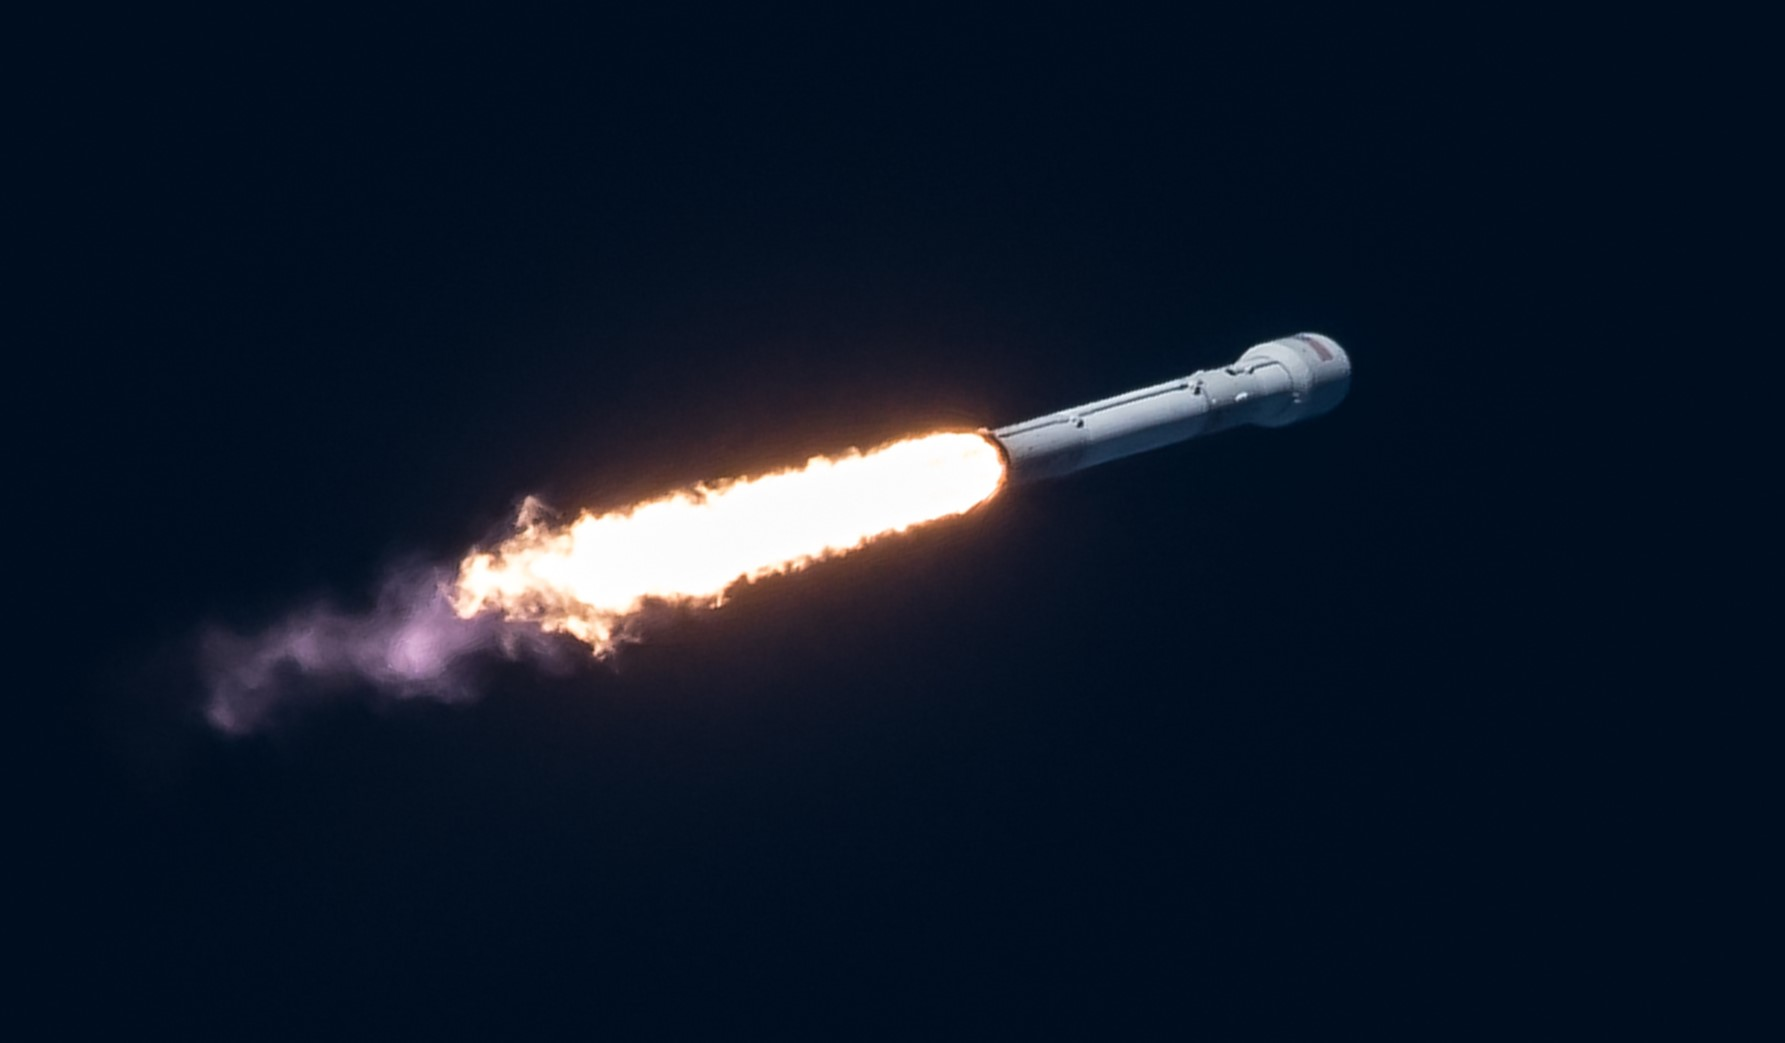 Intelsat 35e Falcon 9 July 2017 (SpaceX) launch 3 crop